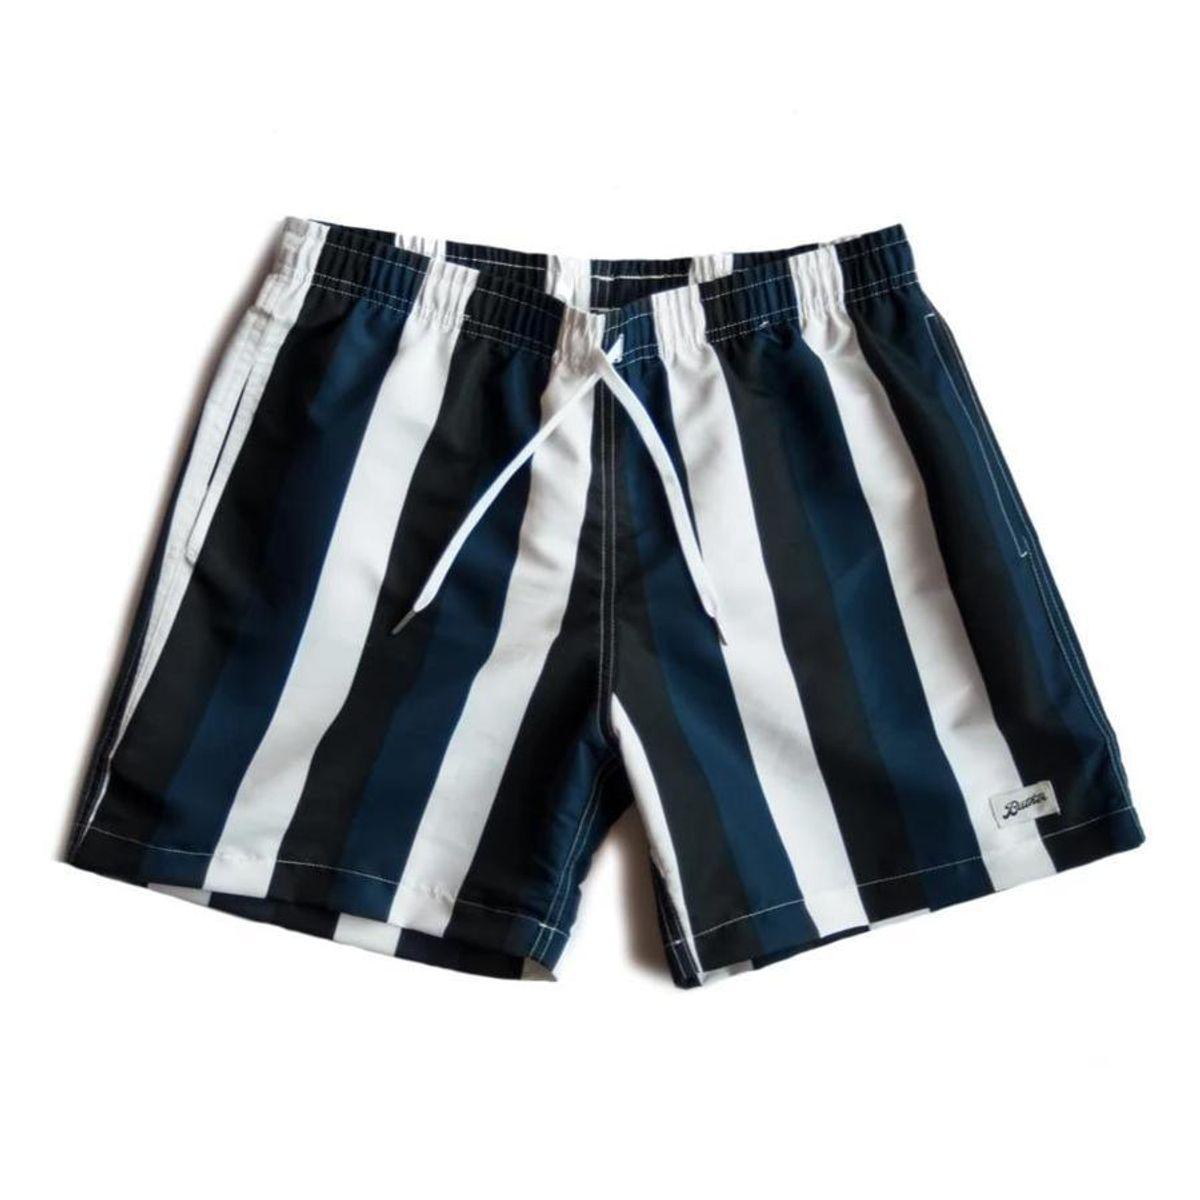 Blue and Black Striped Swim Trunk